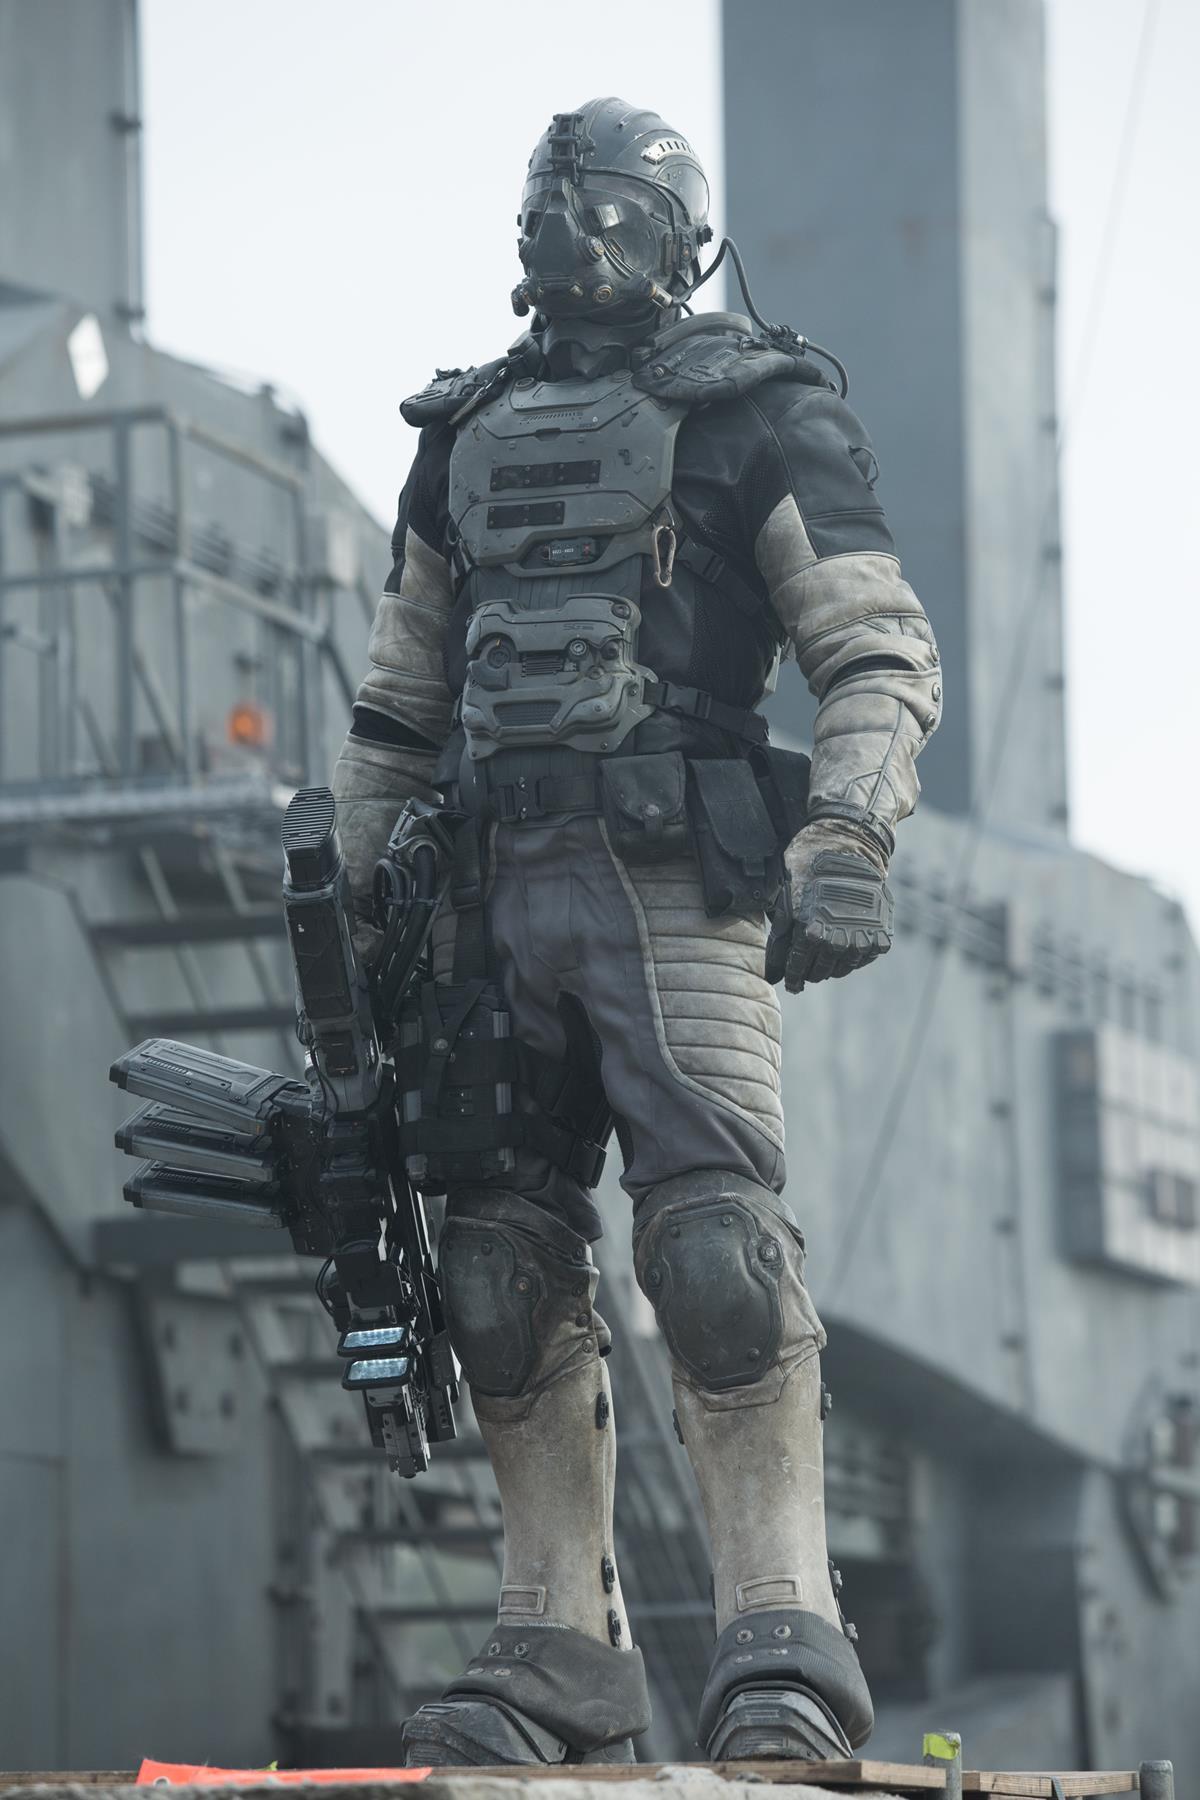 darpa armor component